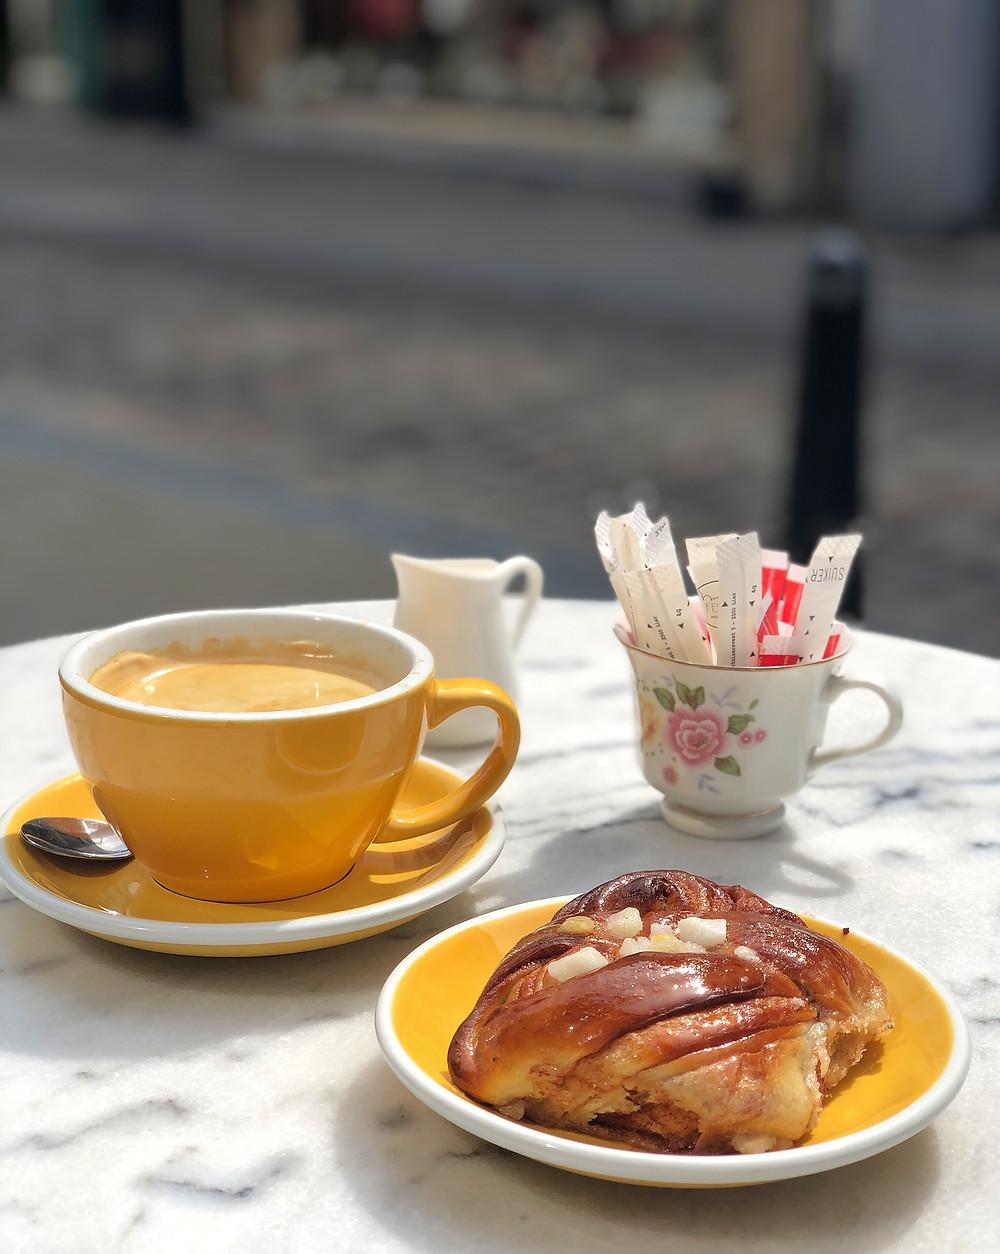 Coffee and cinnamon bun at Feliks Lier